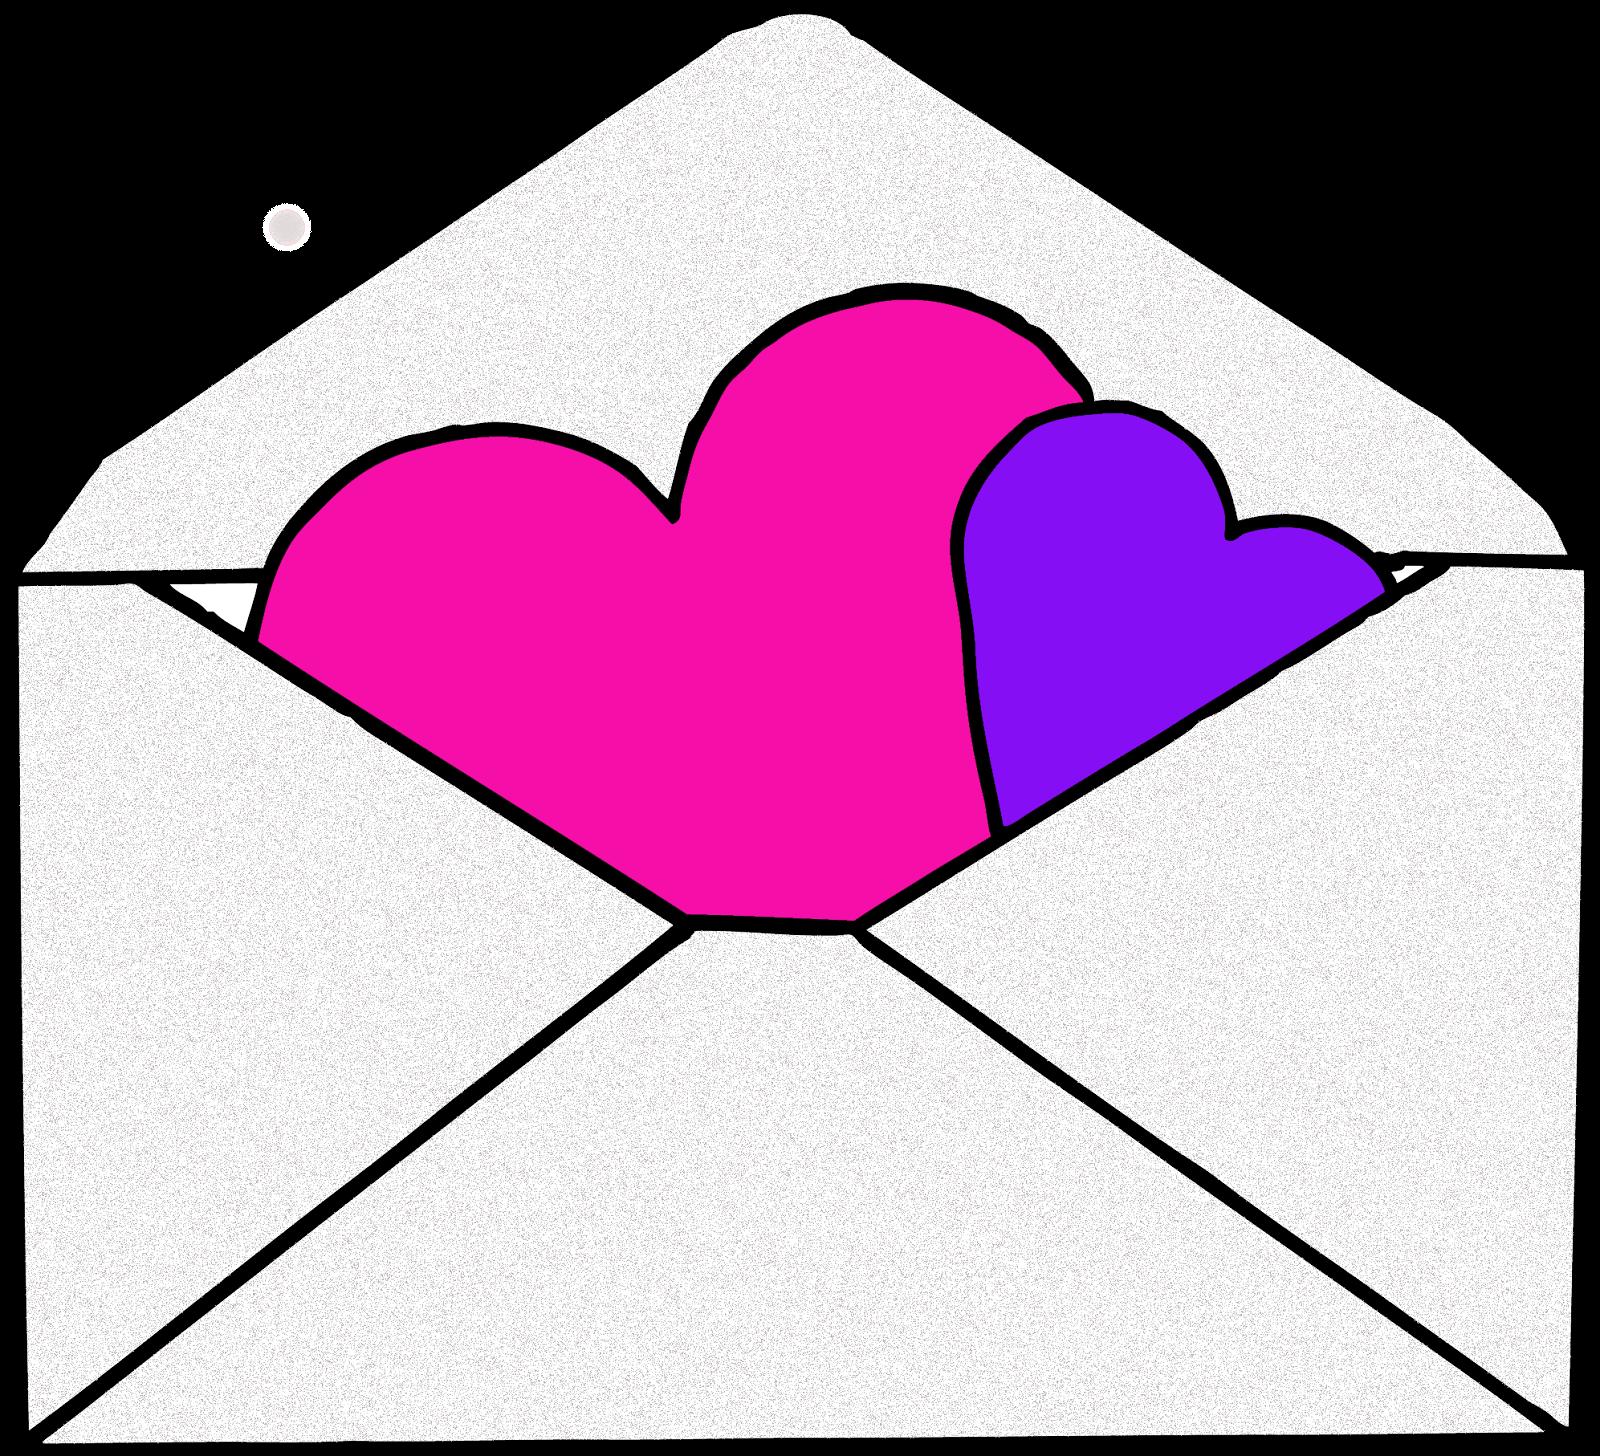 Envelope clipart 2